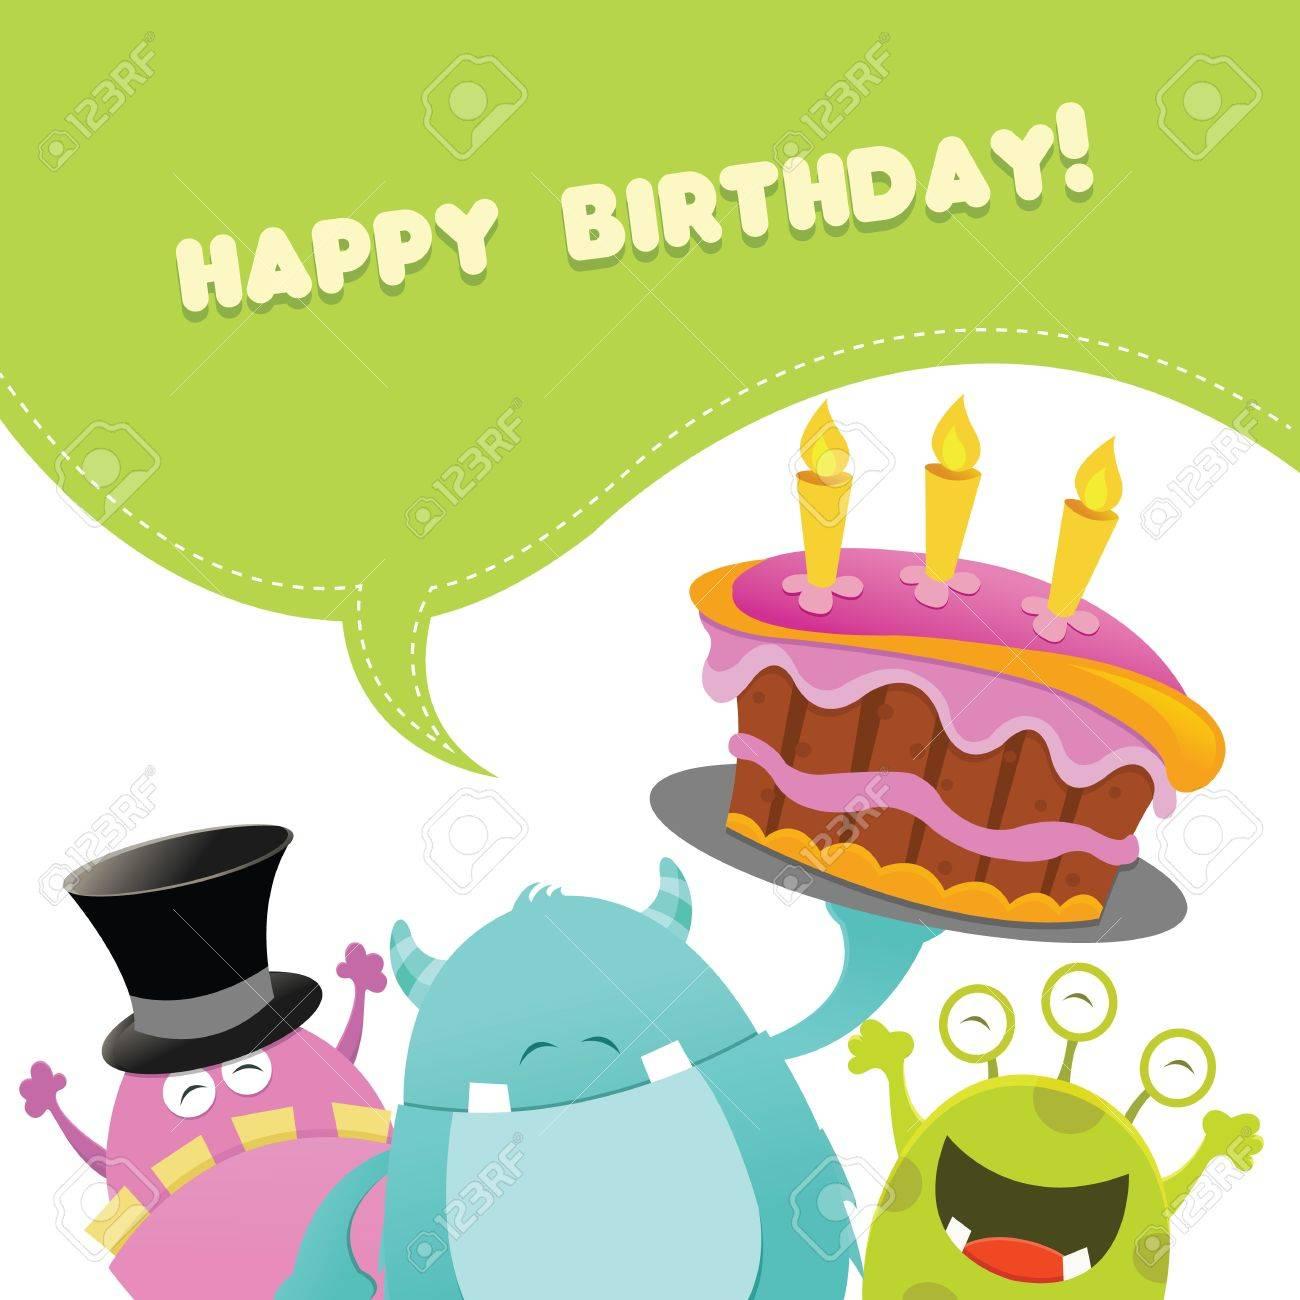 Birthday Monsters Card Stock Vector - 20172270